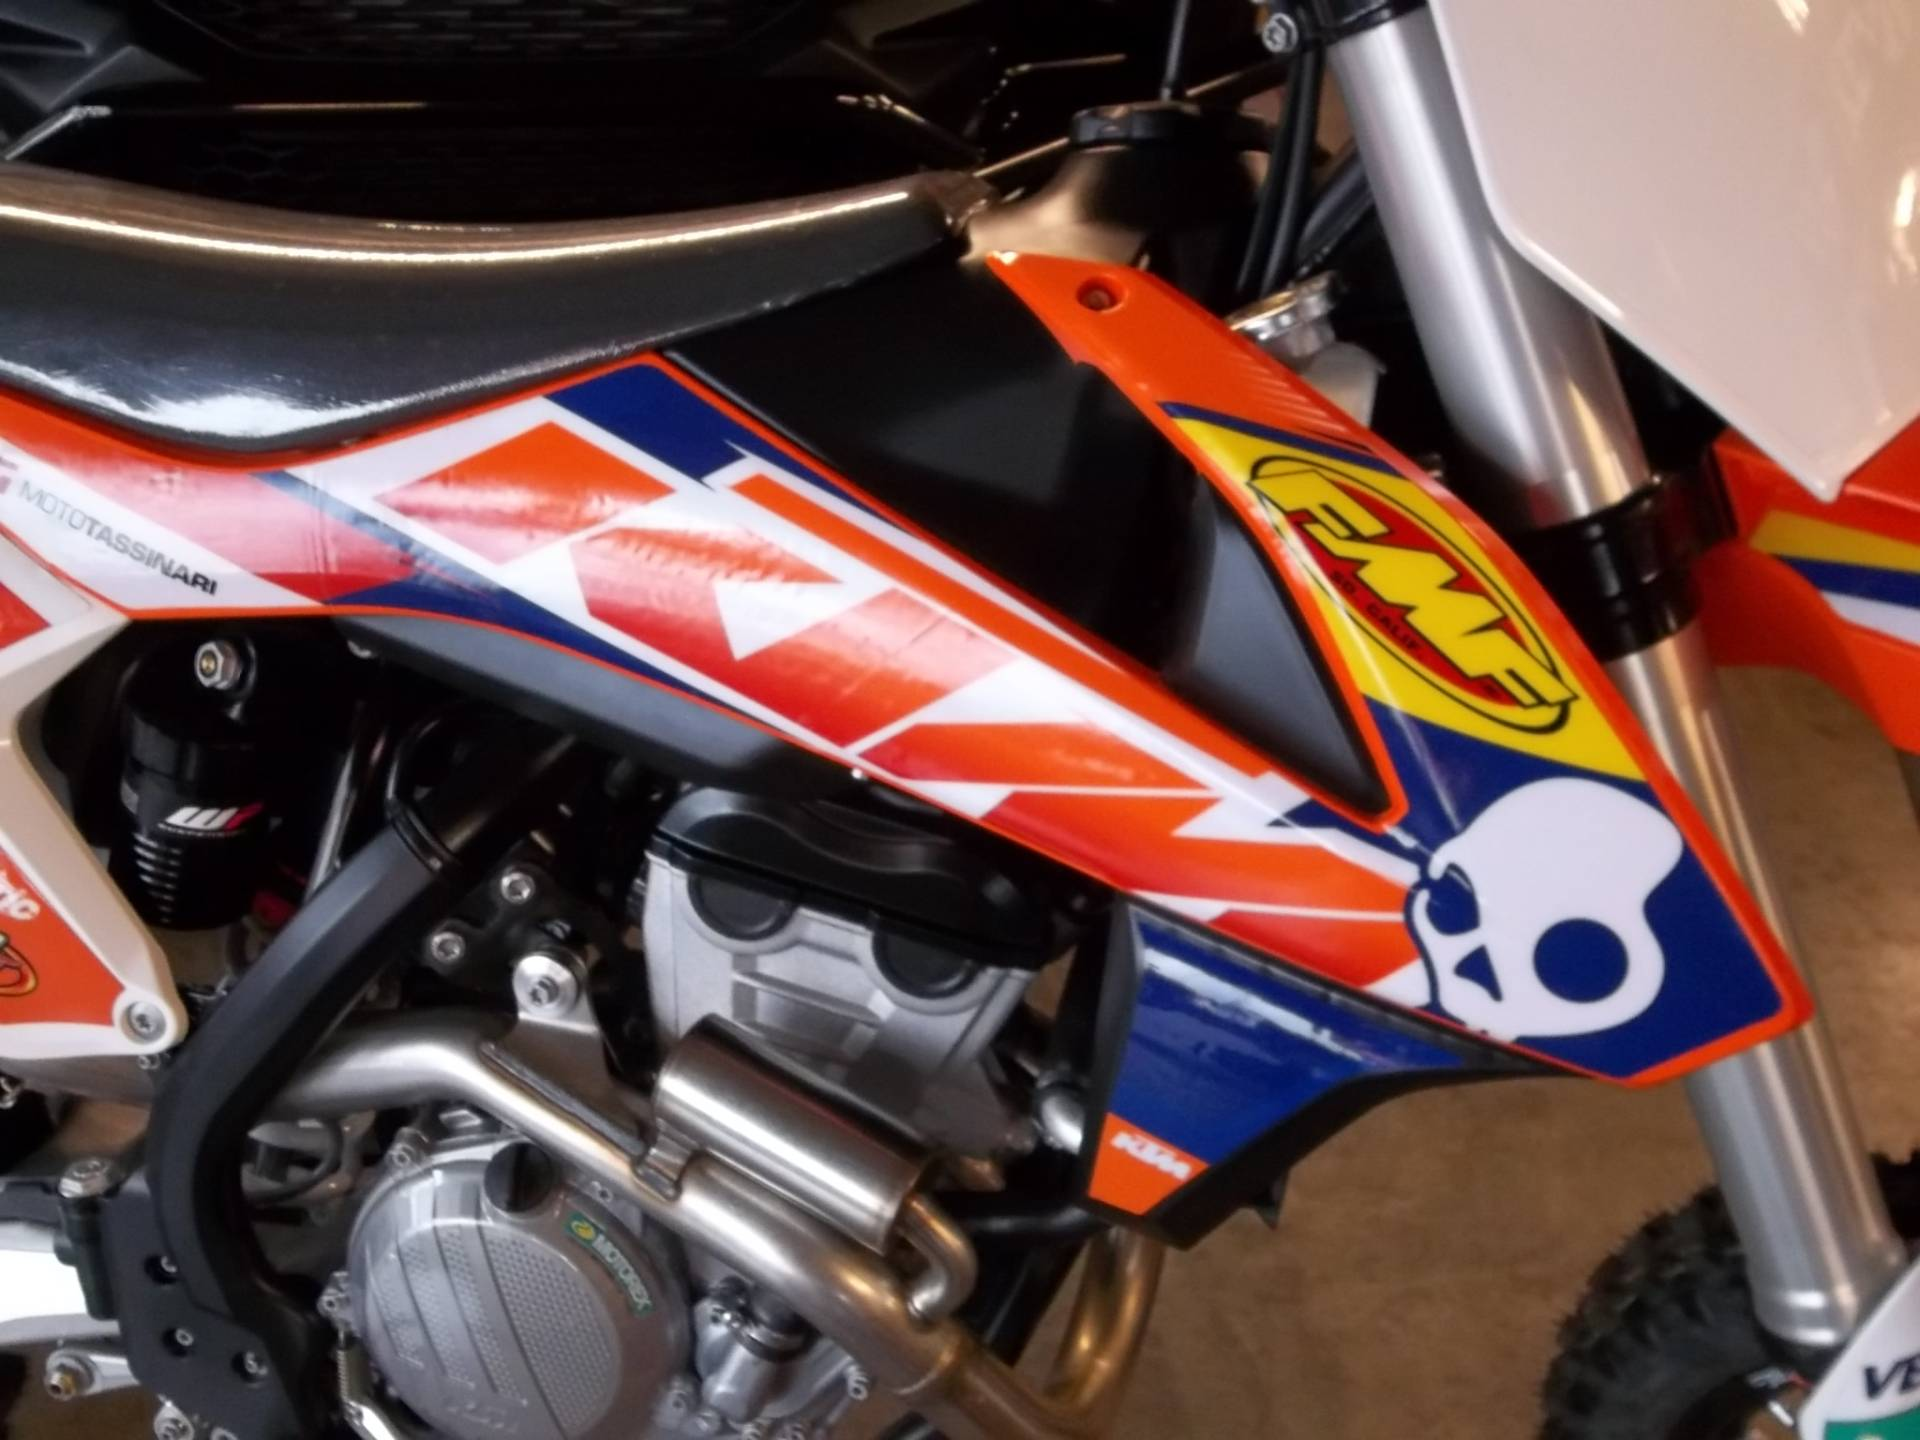 2016 KTM 250 SX-F in Grass Valley, California